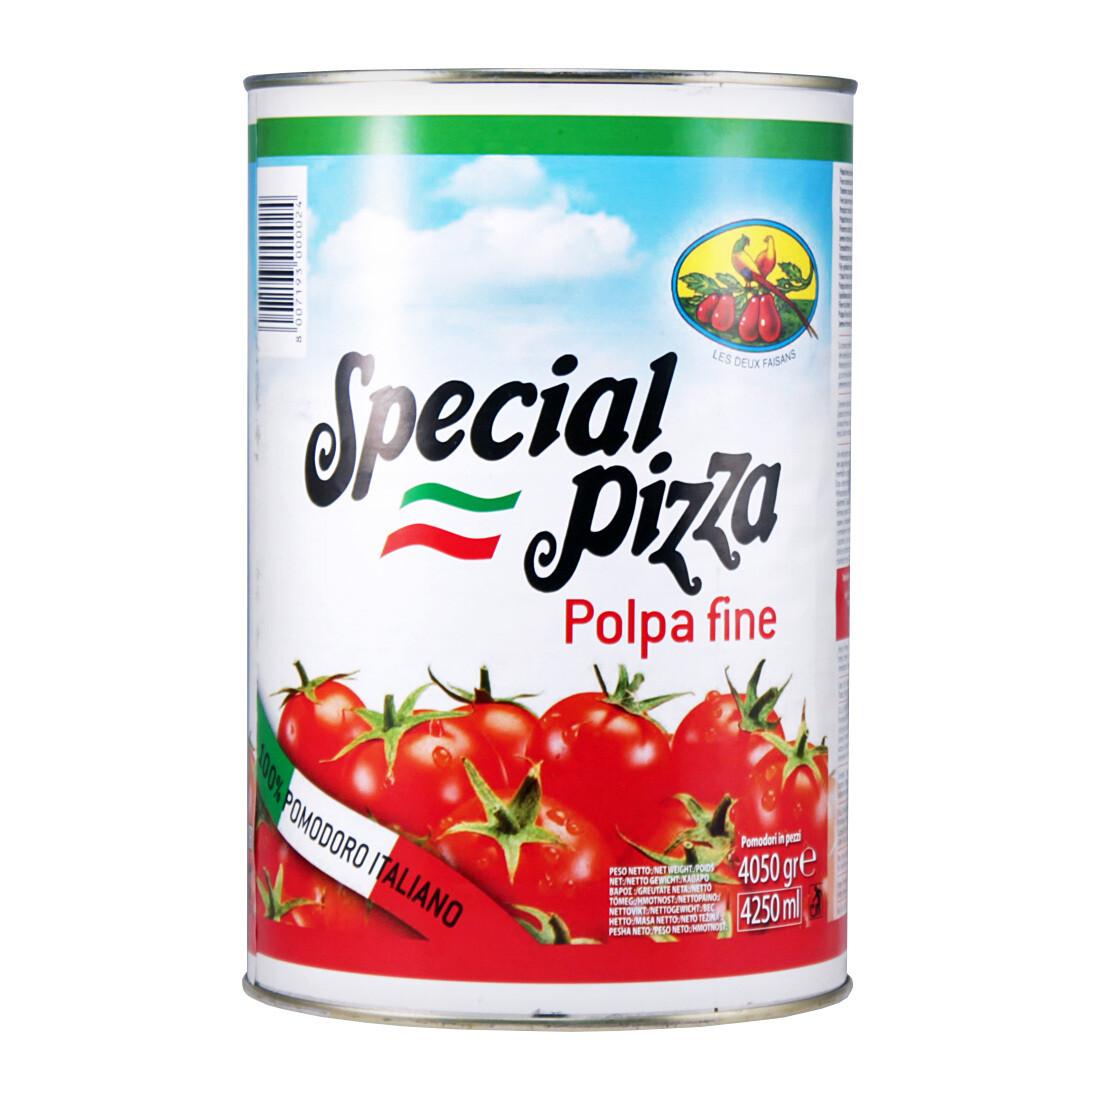 Tomaattimurska (polpa fine) | Crushed Tomato | STERILTOM | 4,05KG